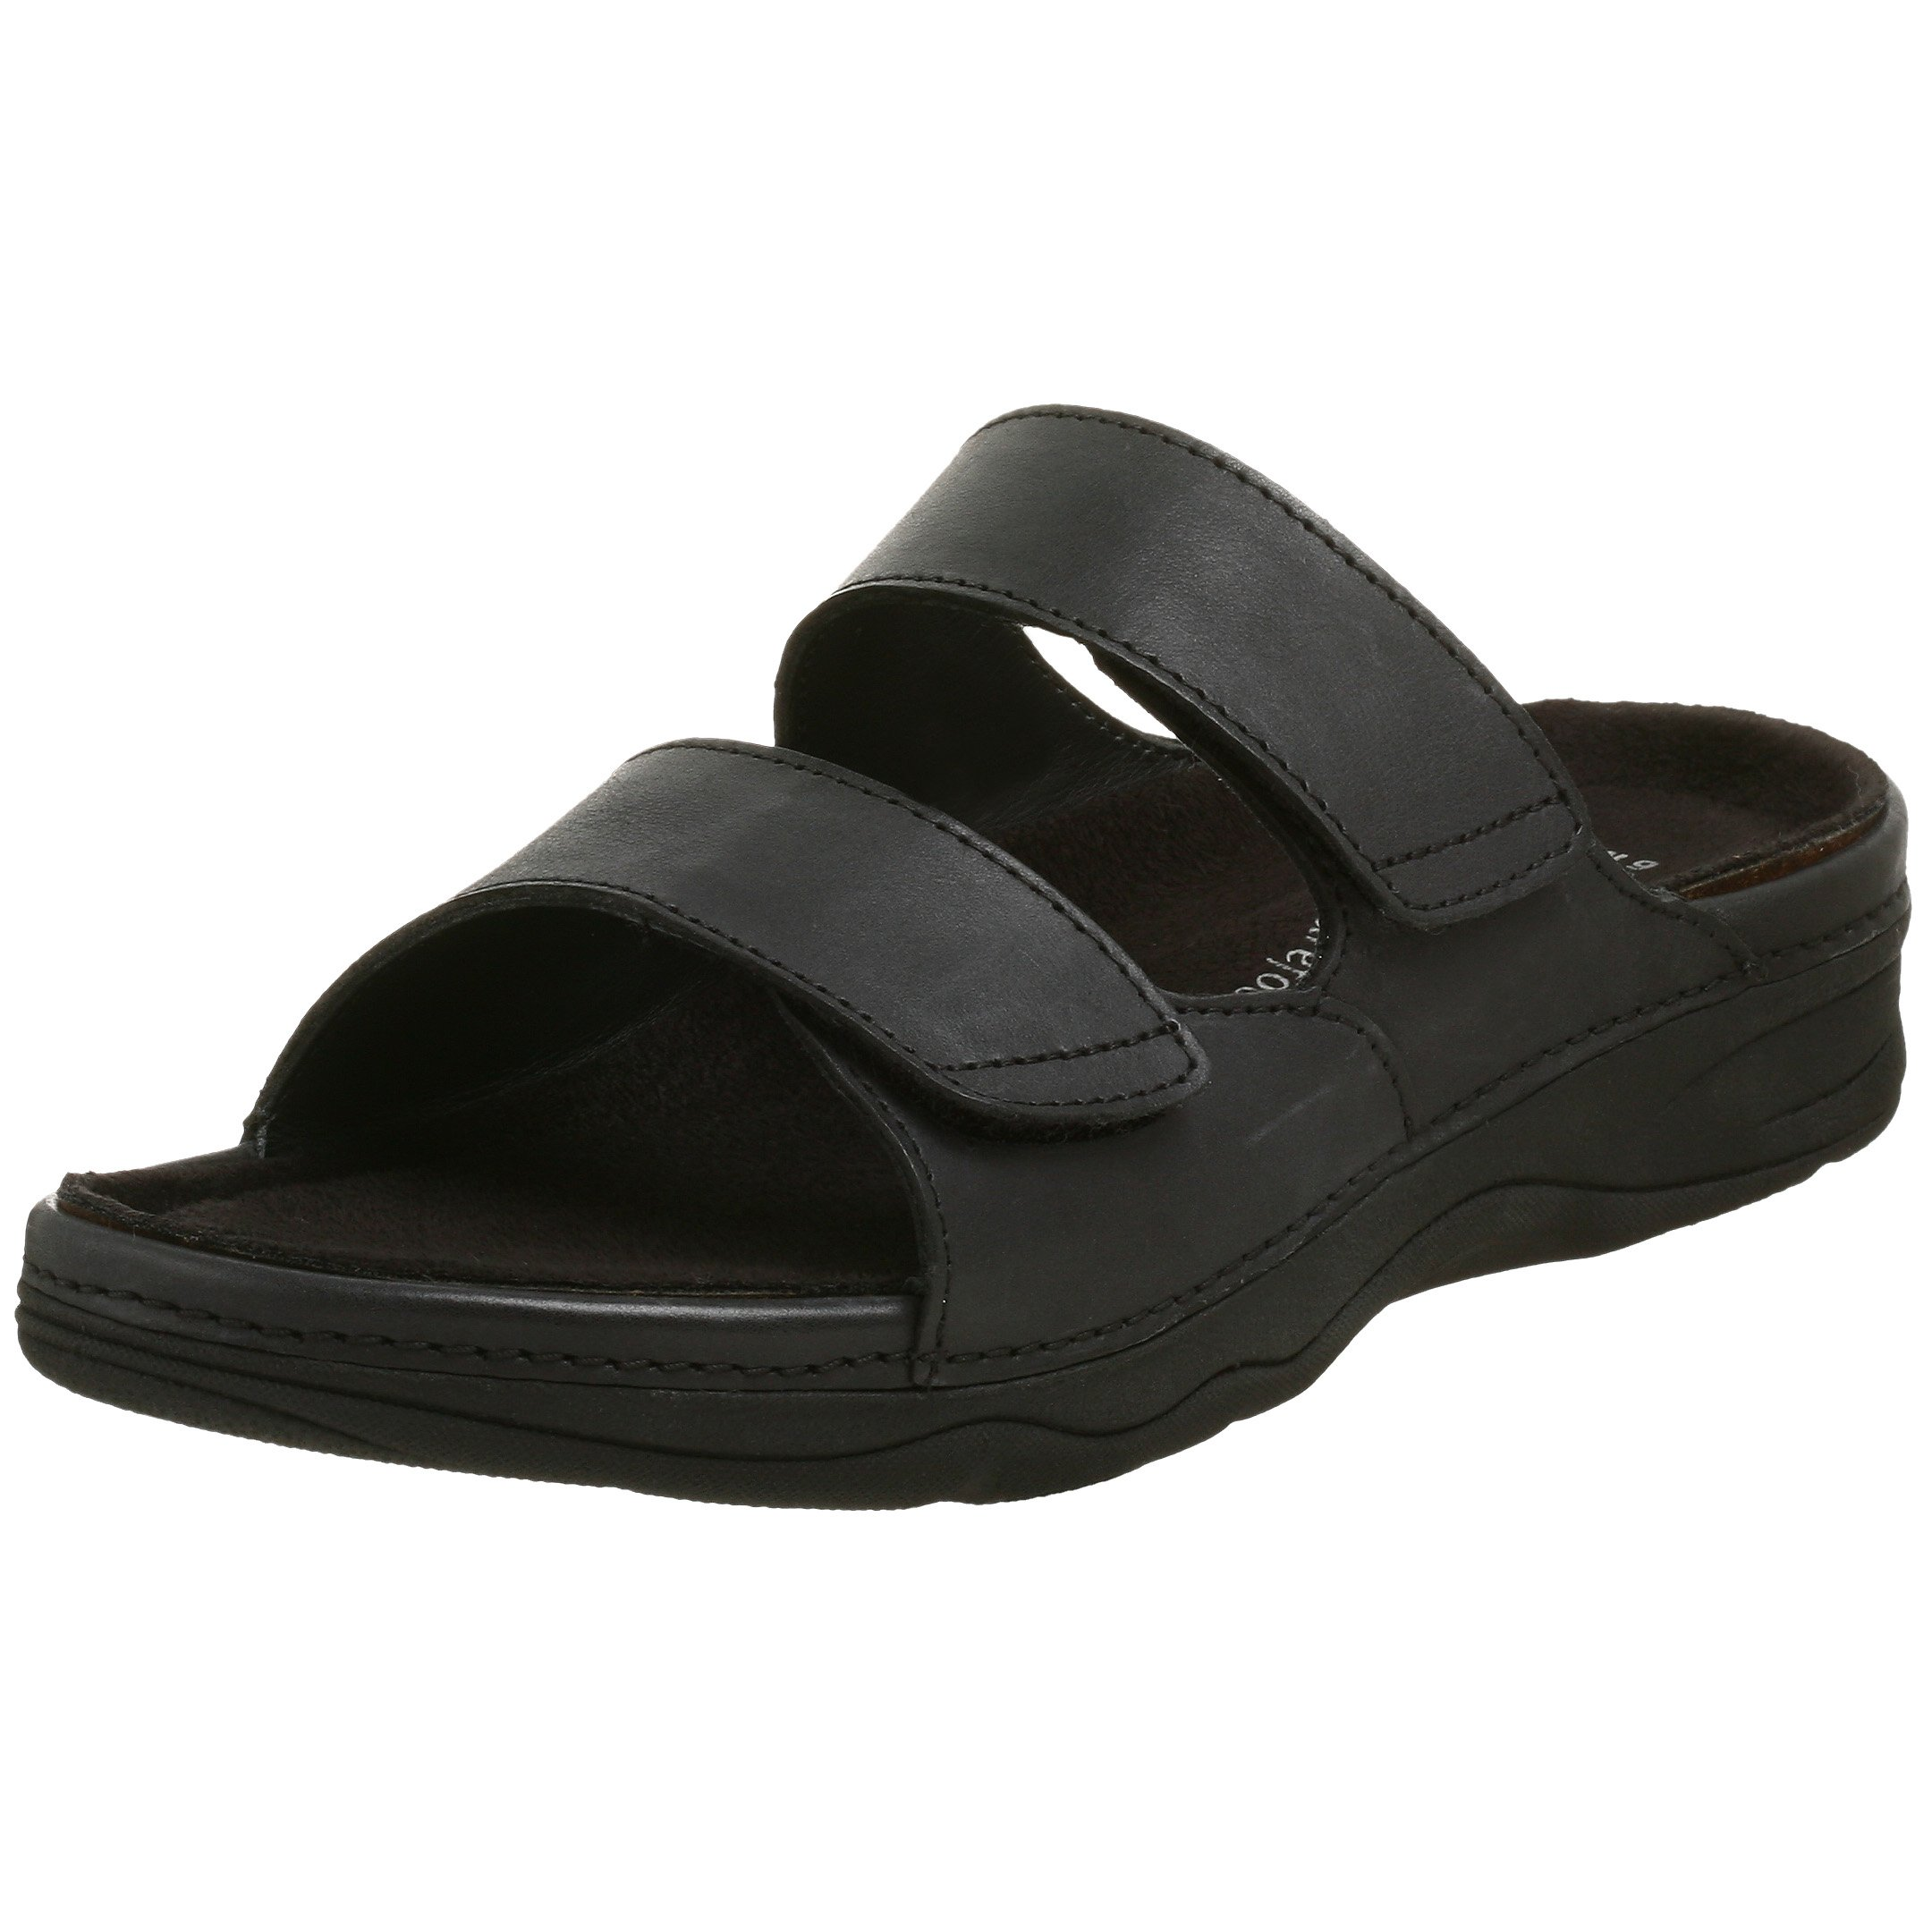 Drew Shoe Women's Milan Sandal,Black Leather,9.5 W US